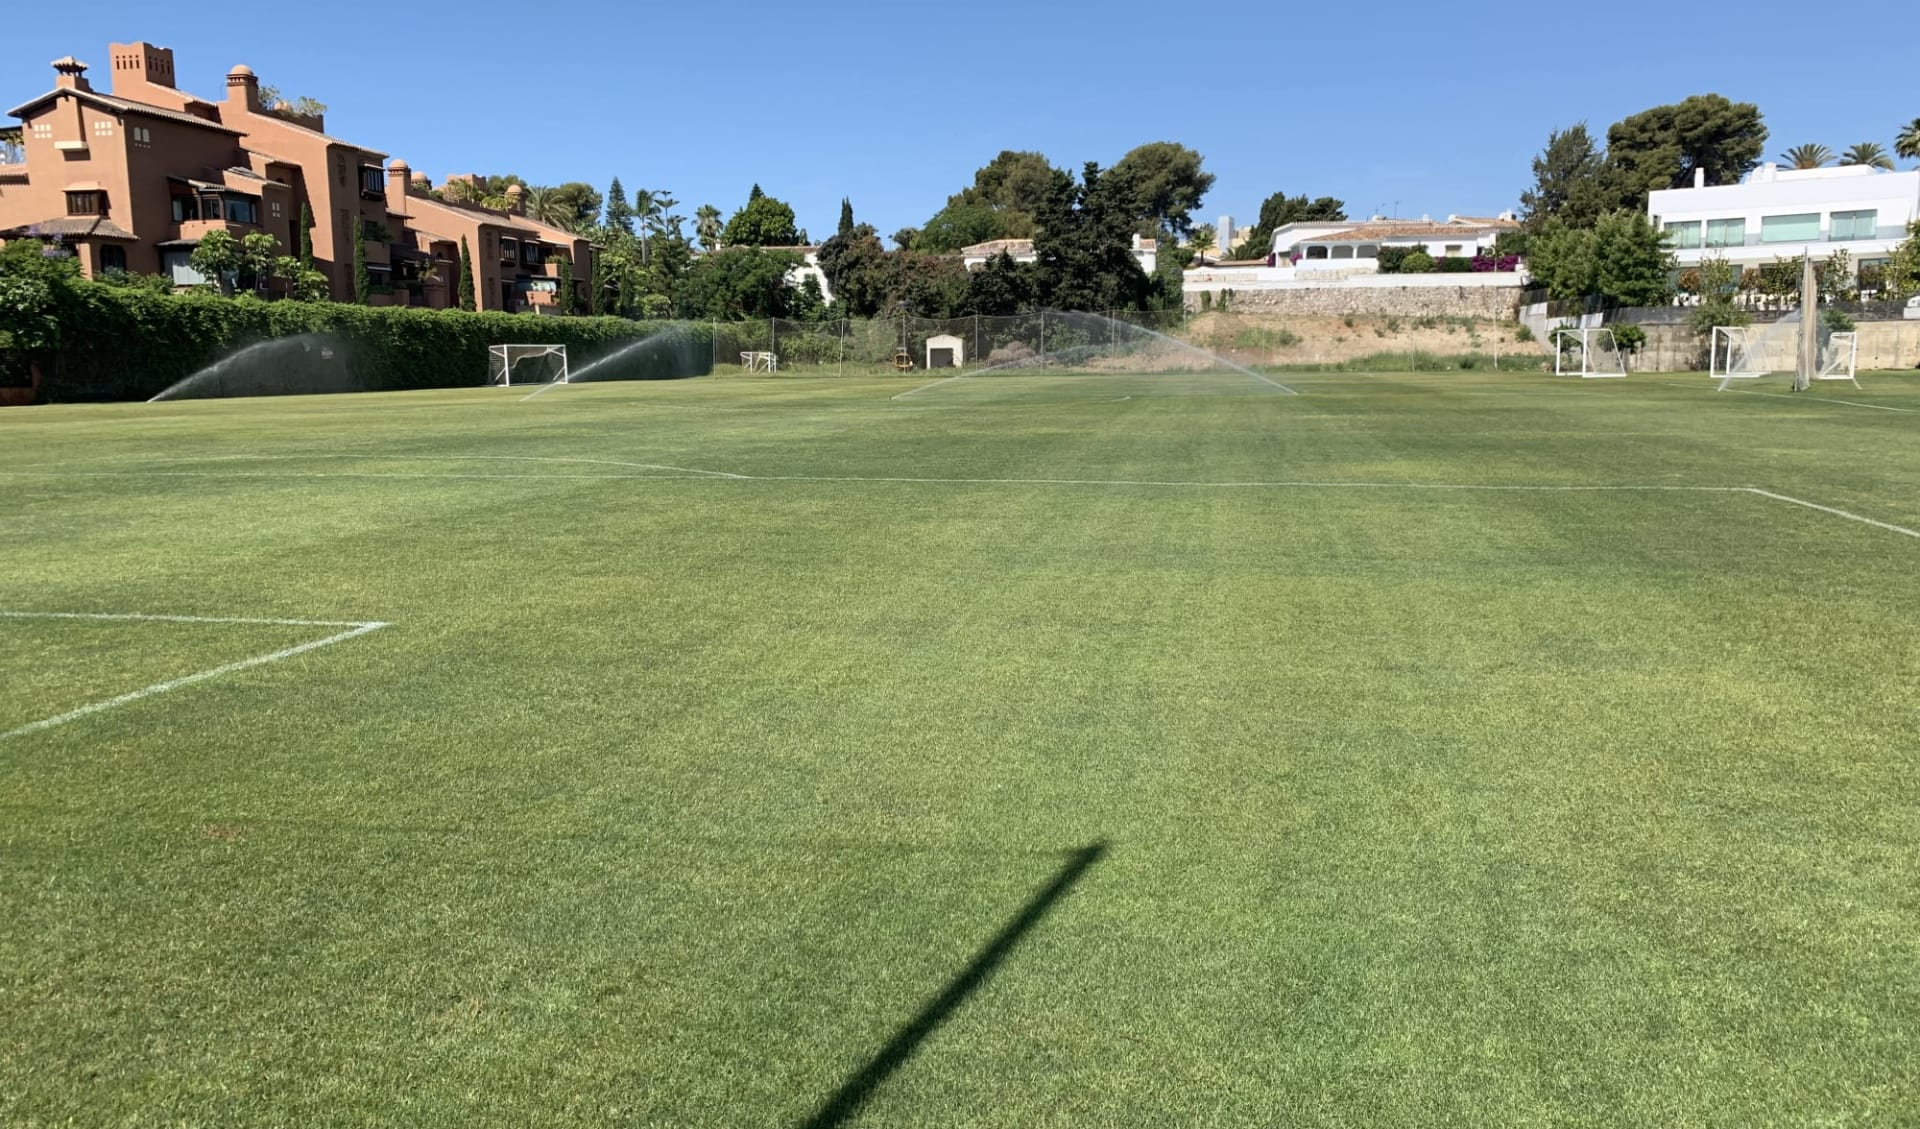 Estepona - Hotel Bluebay Banus ab Malaga: Atalaya Park 3